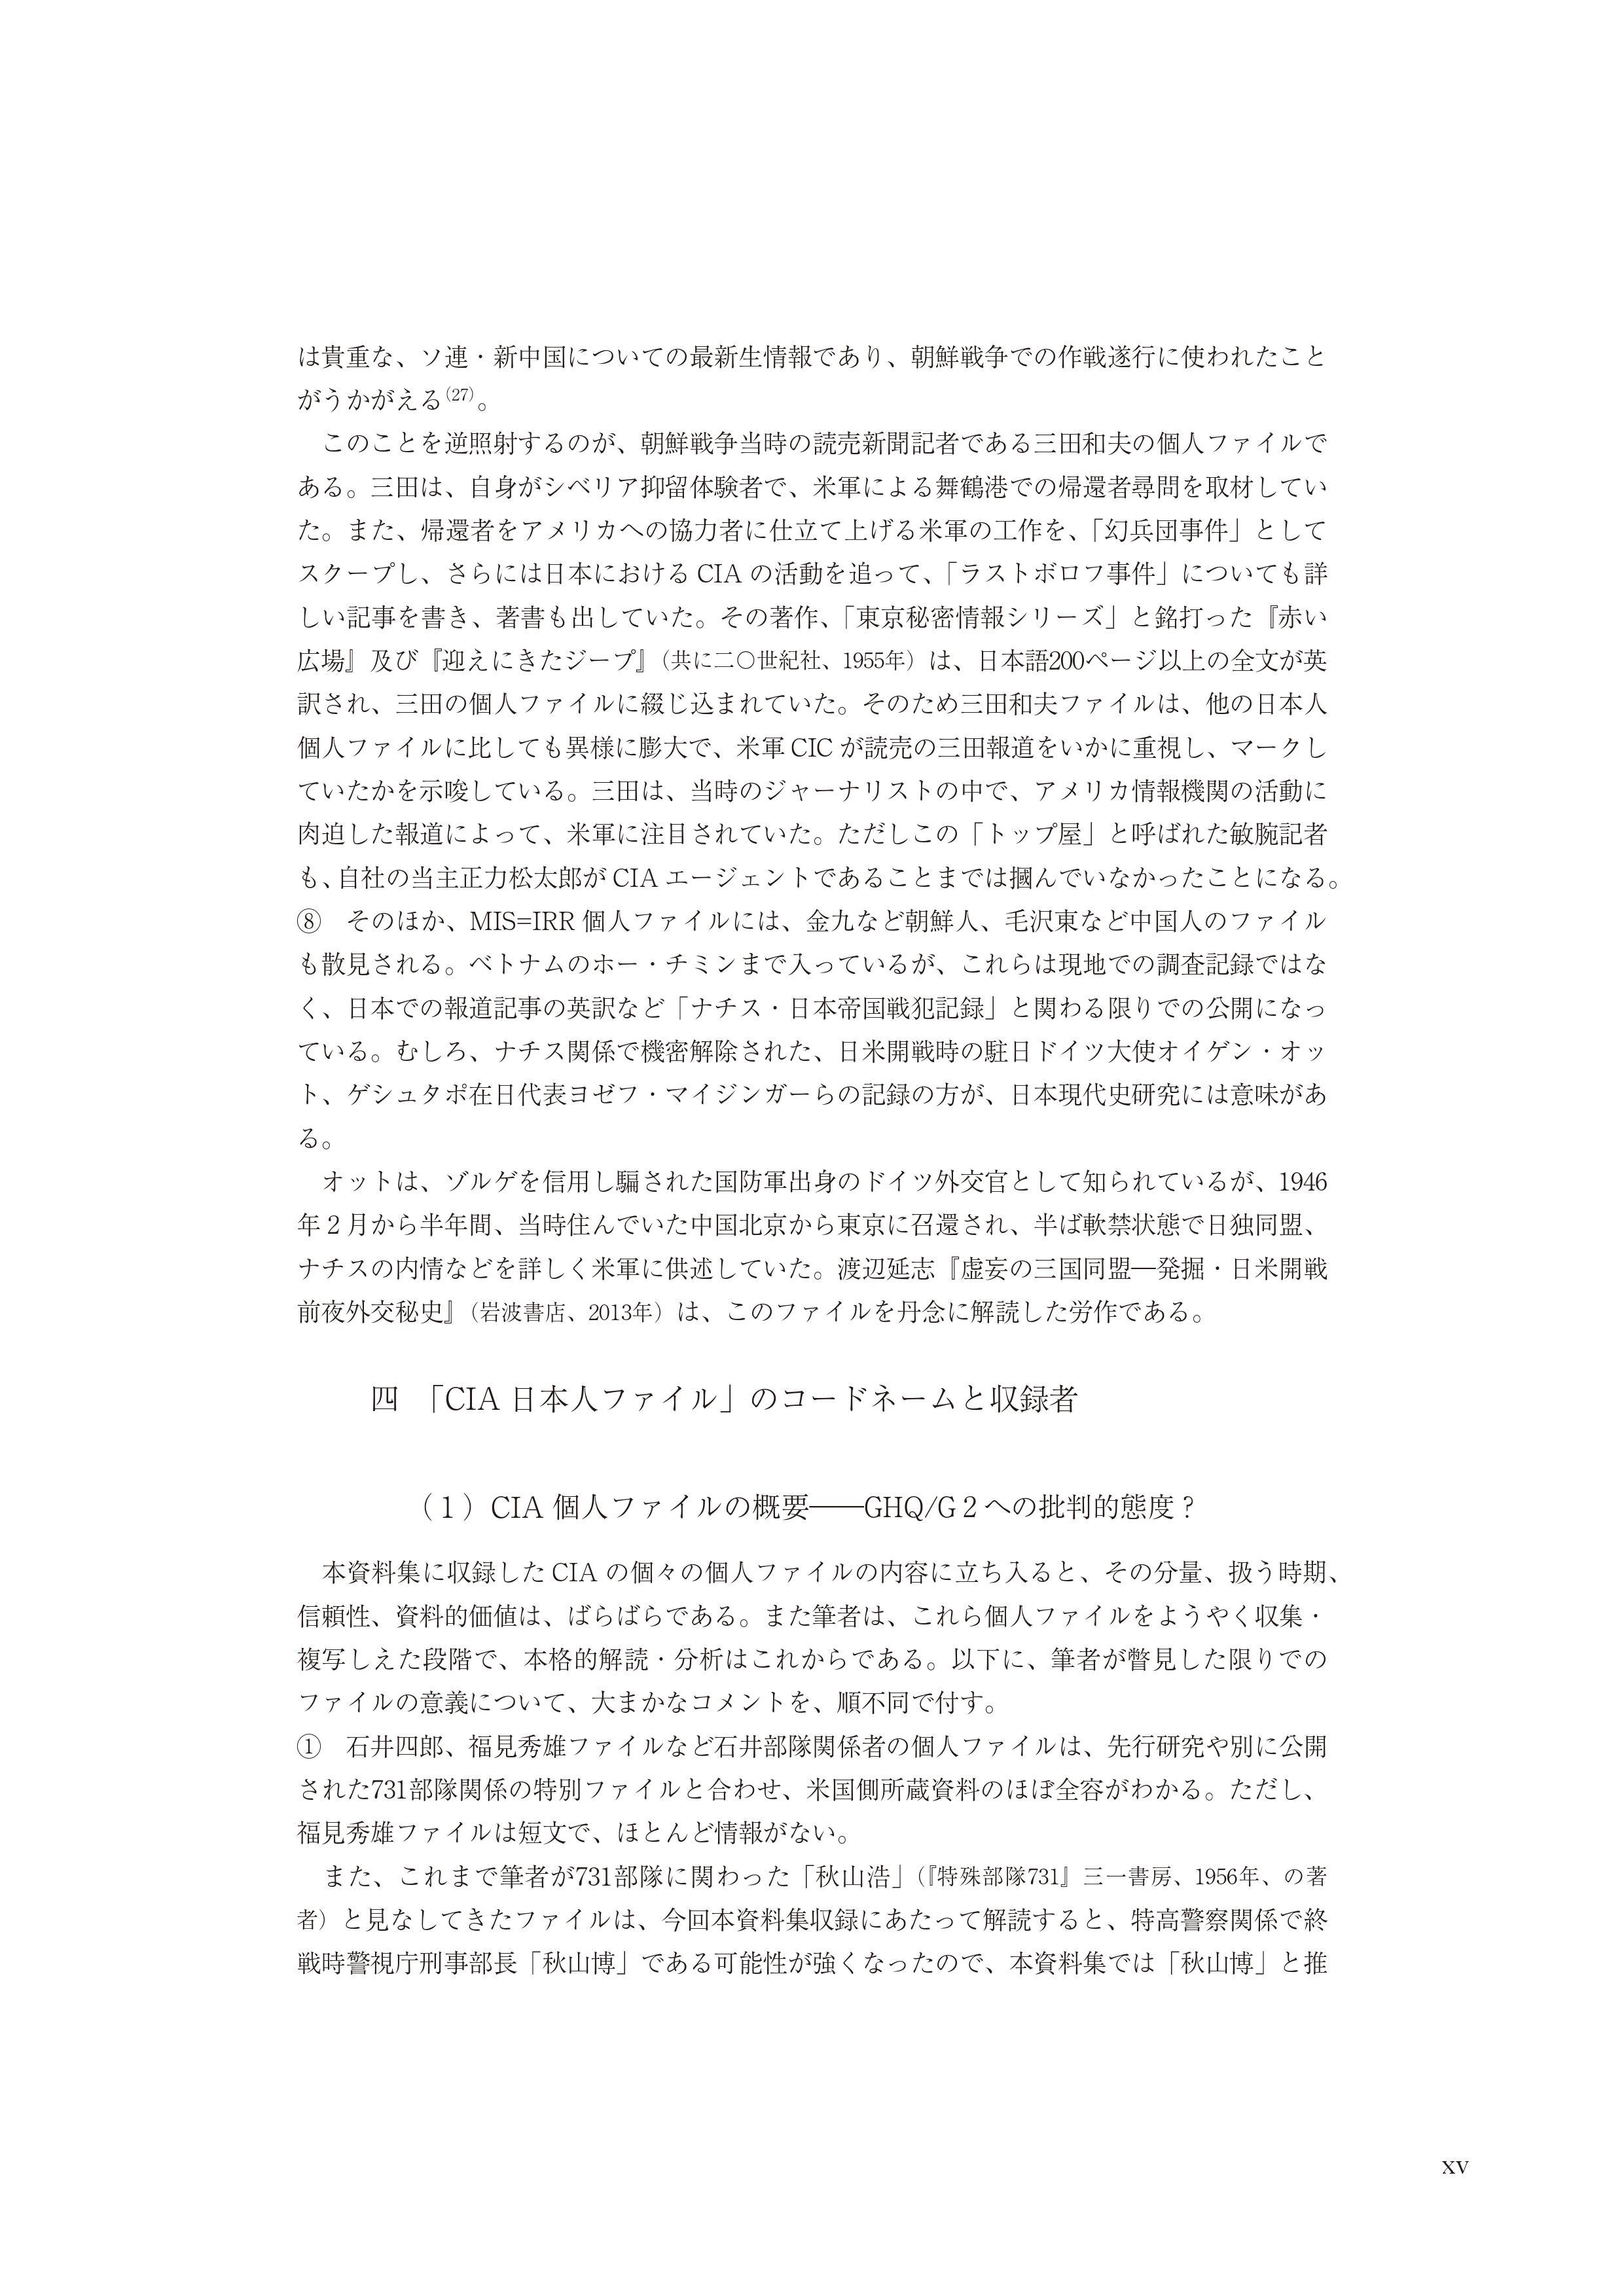 CIA日本人ファイル0001 (15)